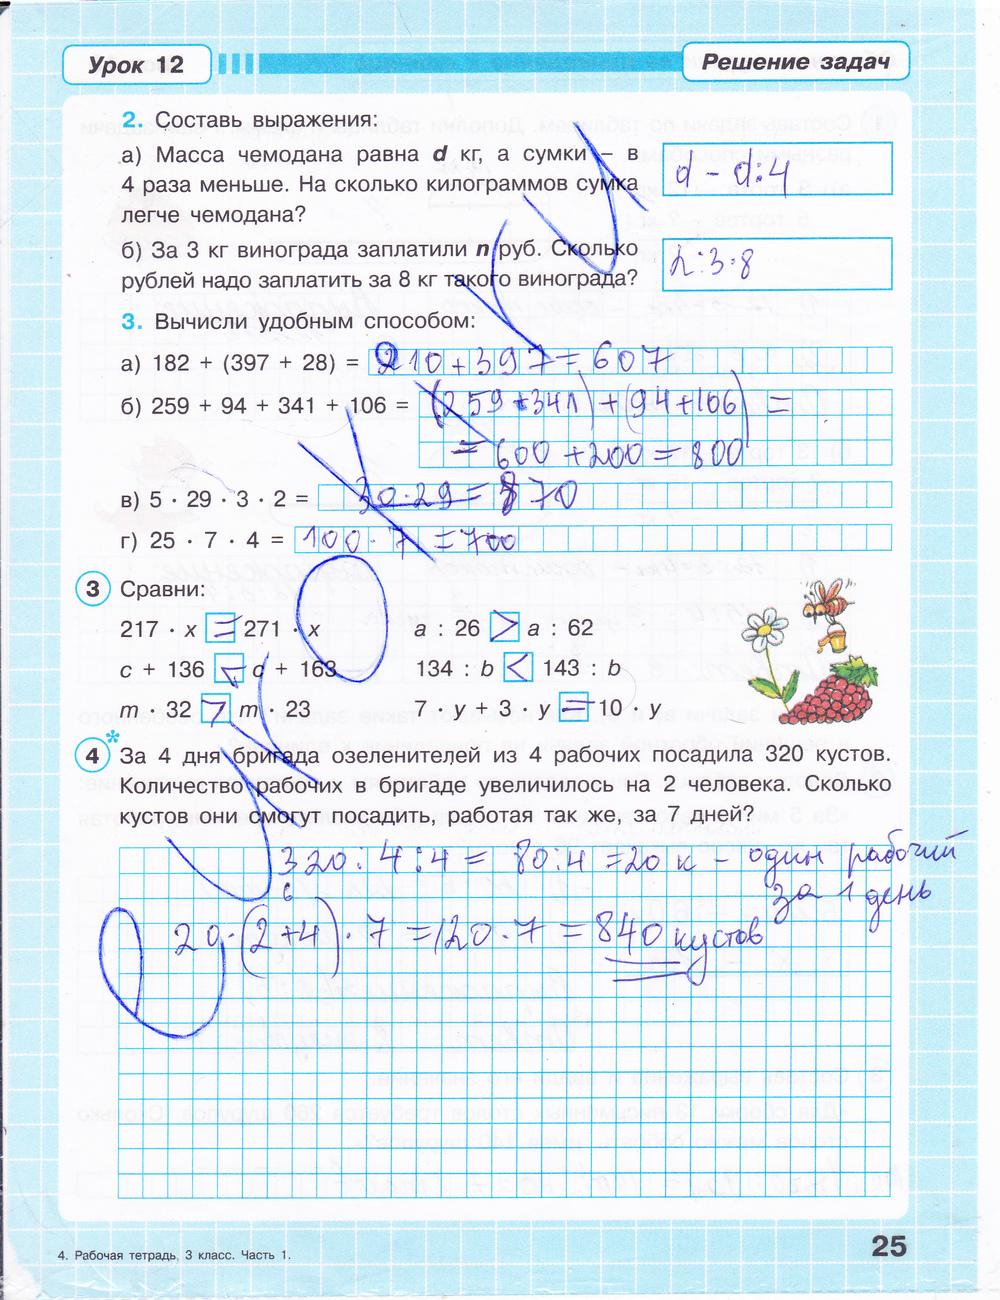 Решение задач по математике 5 класс петерсон пример решения задач на показатели вариации